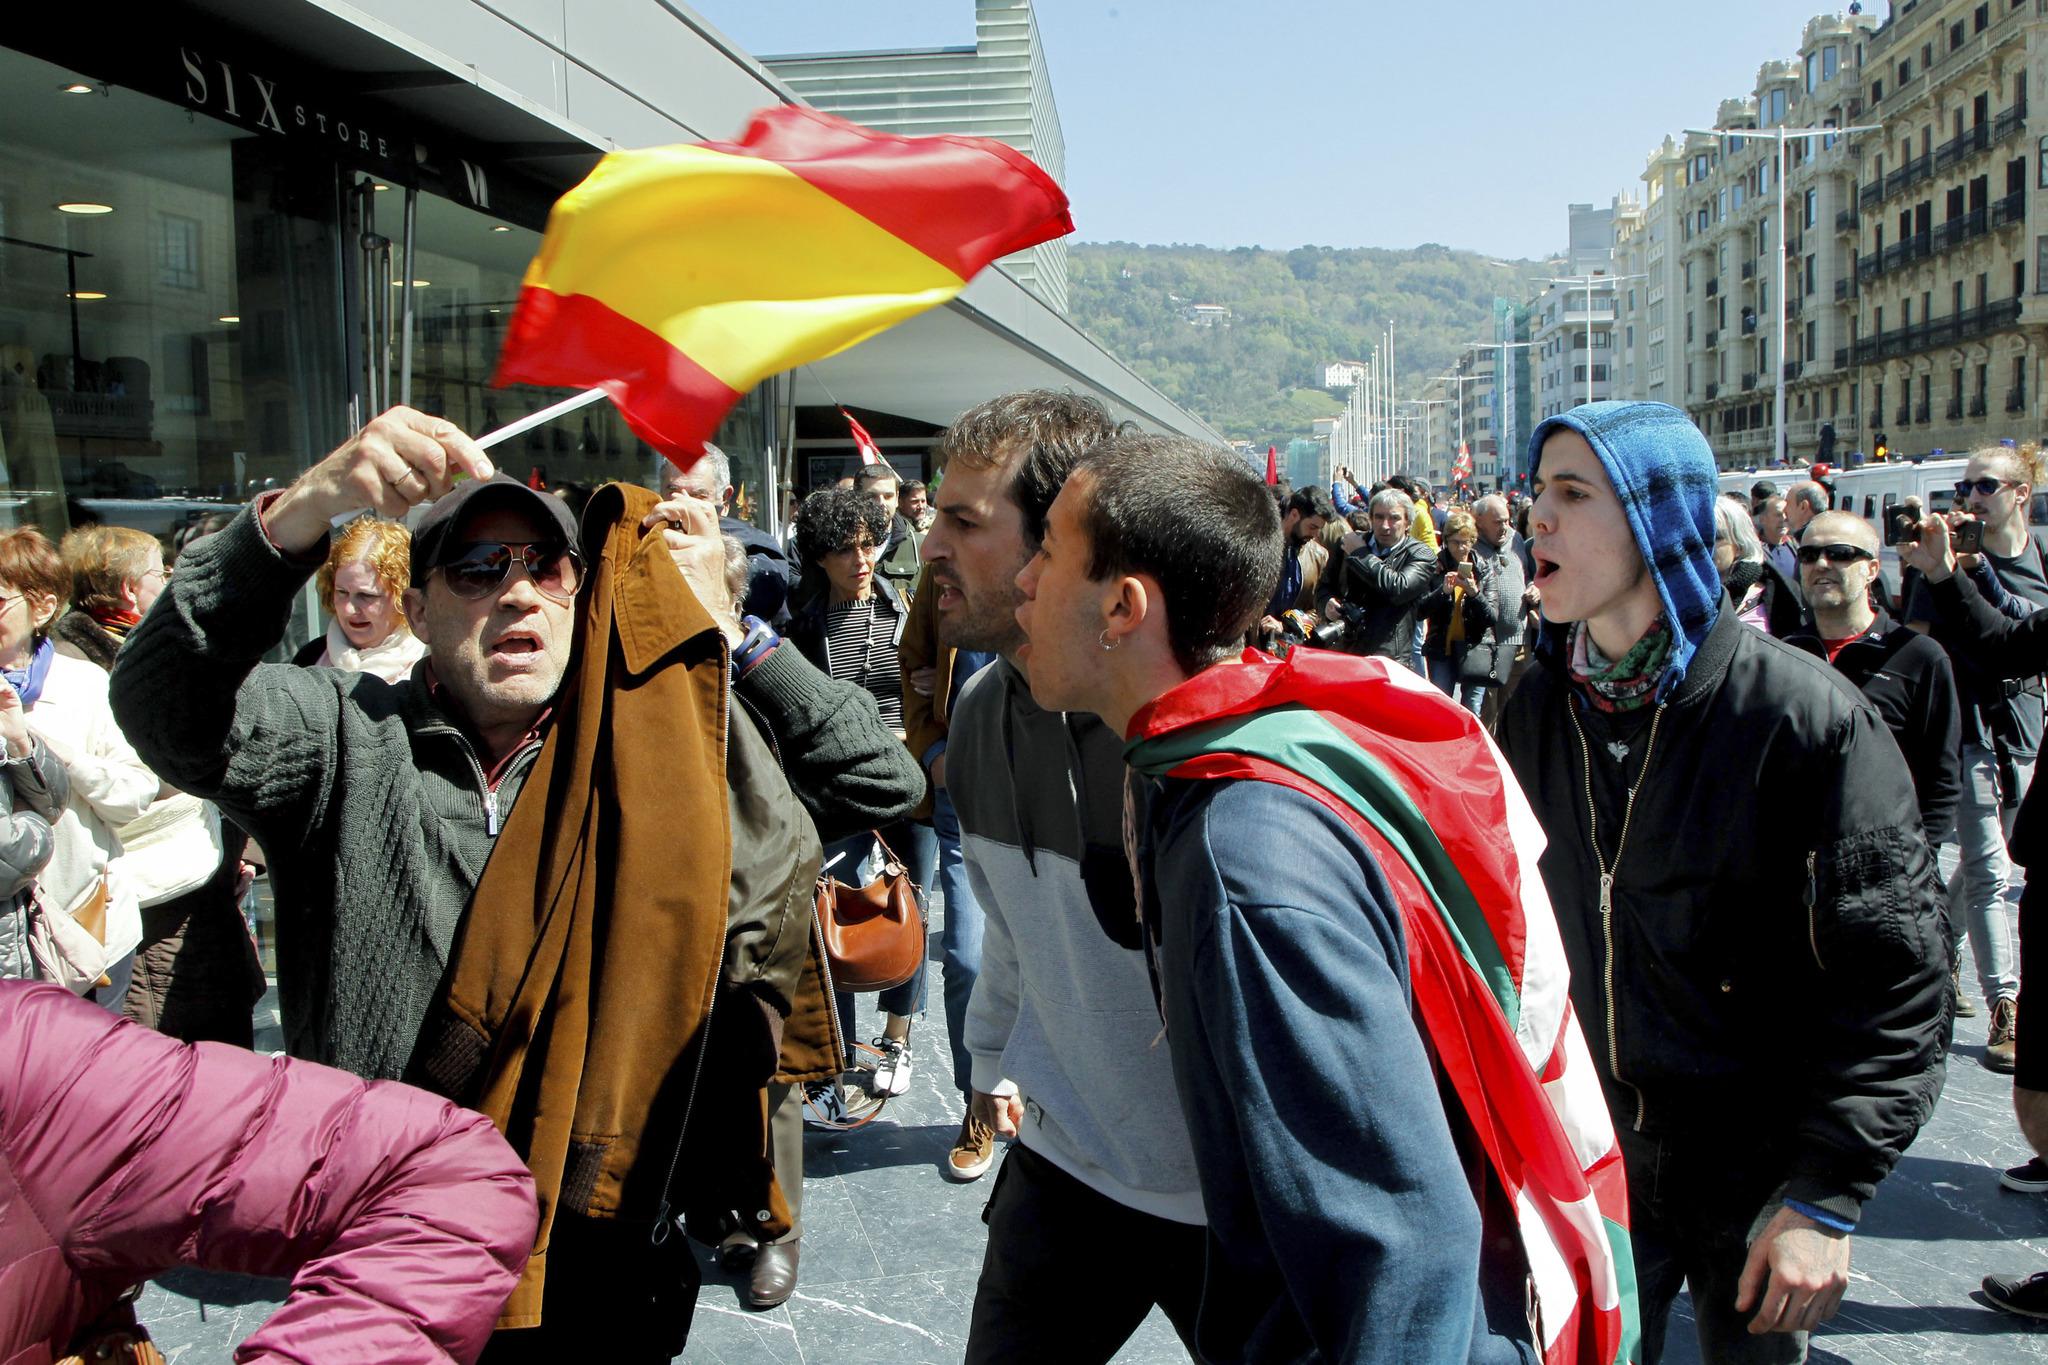 Incidentes a la salida de un mitin de Abascal en San Sebastián